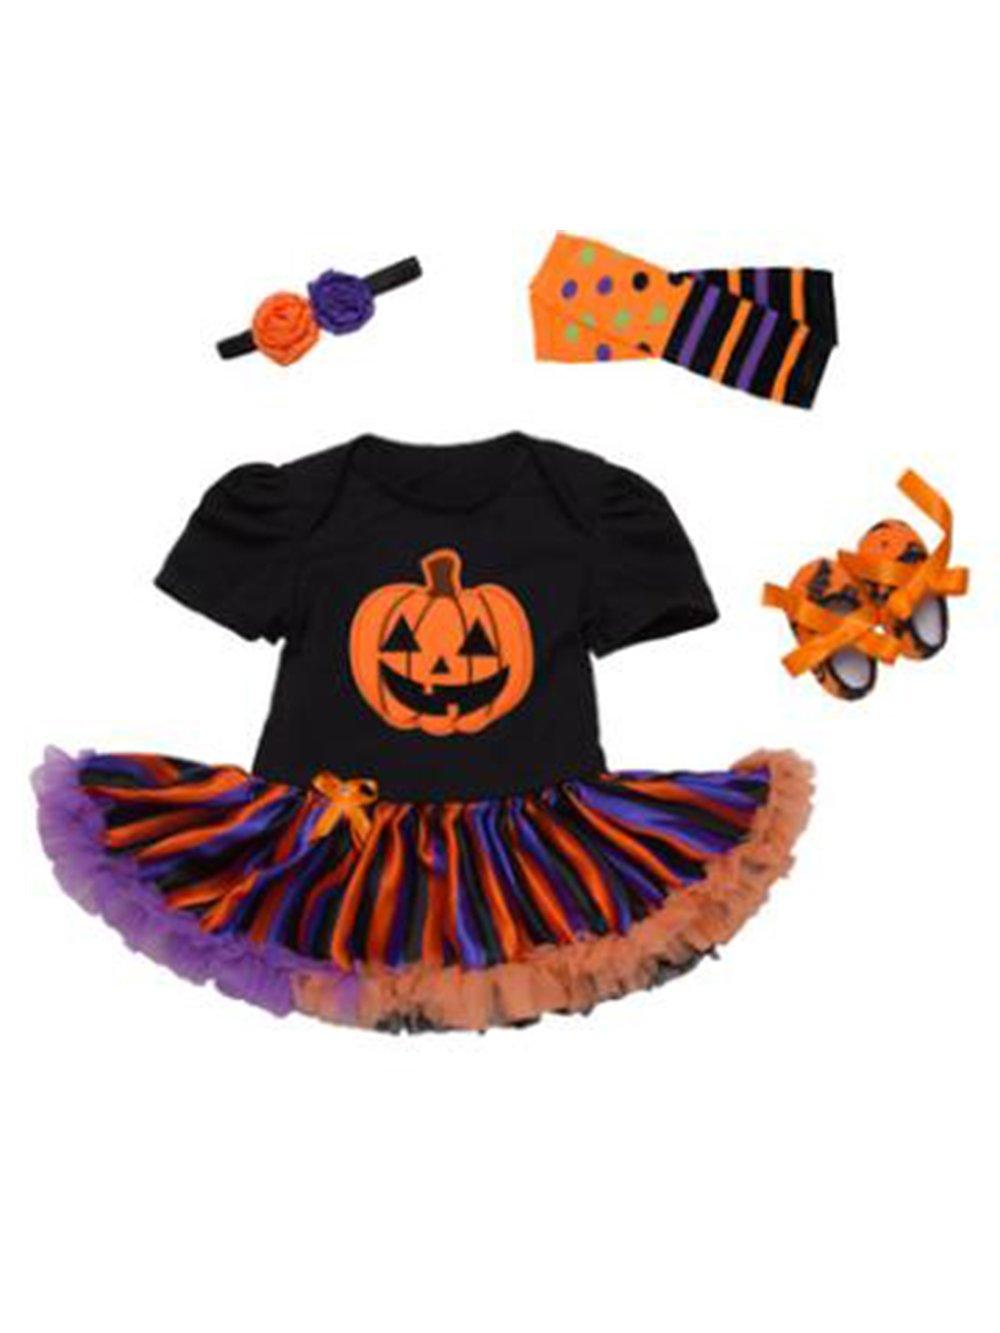 Neonata Appena Nata Pumpkin di Halloween Gonna Pagliaccetto Tutu Romper + Fascia + Scarpa + Calze 4pcs Imposta Abitini